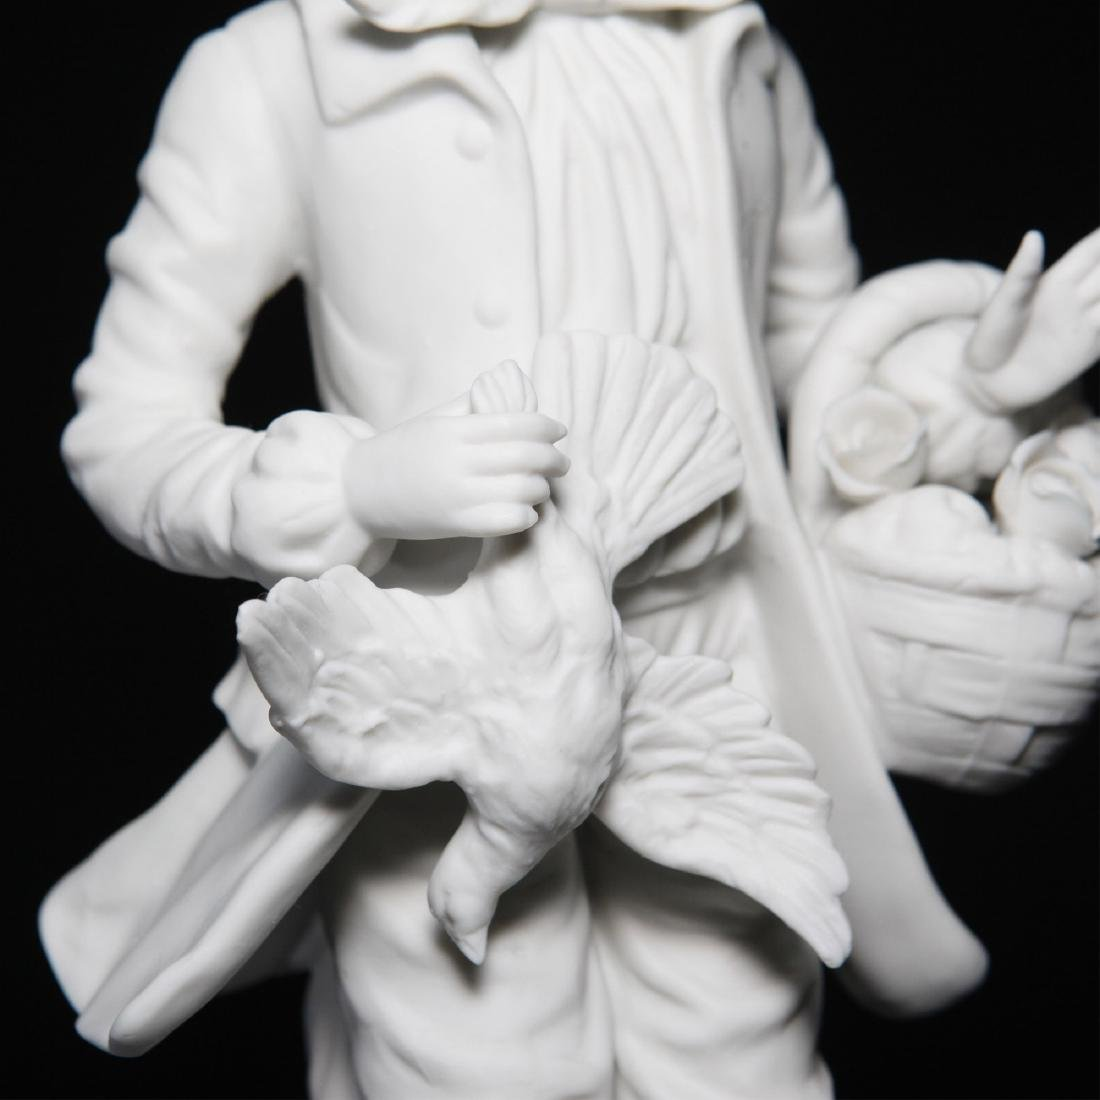 Bisque Porcelain Statue Sculptural Figurine - 3